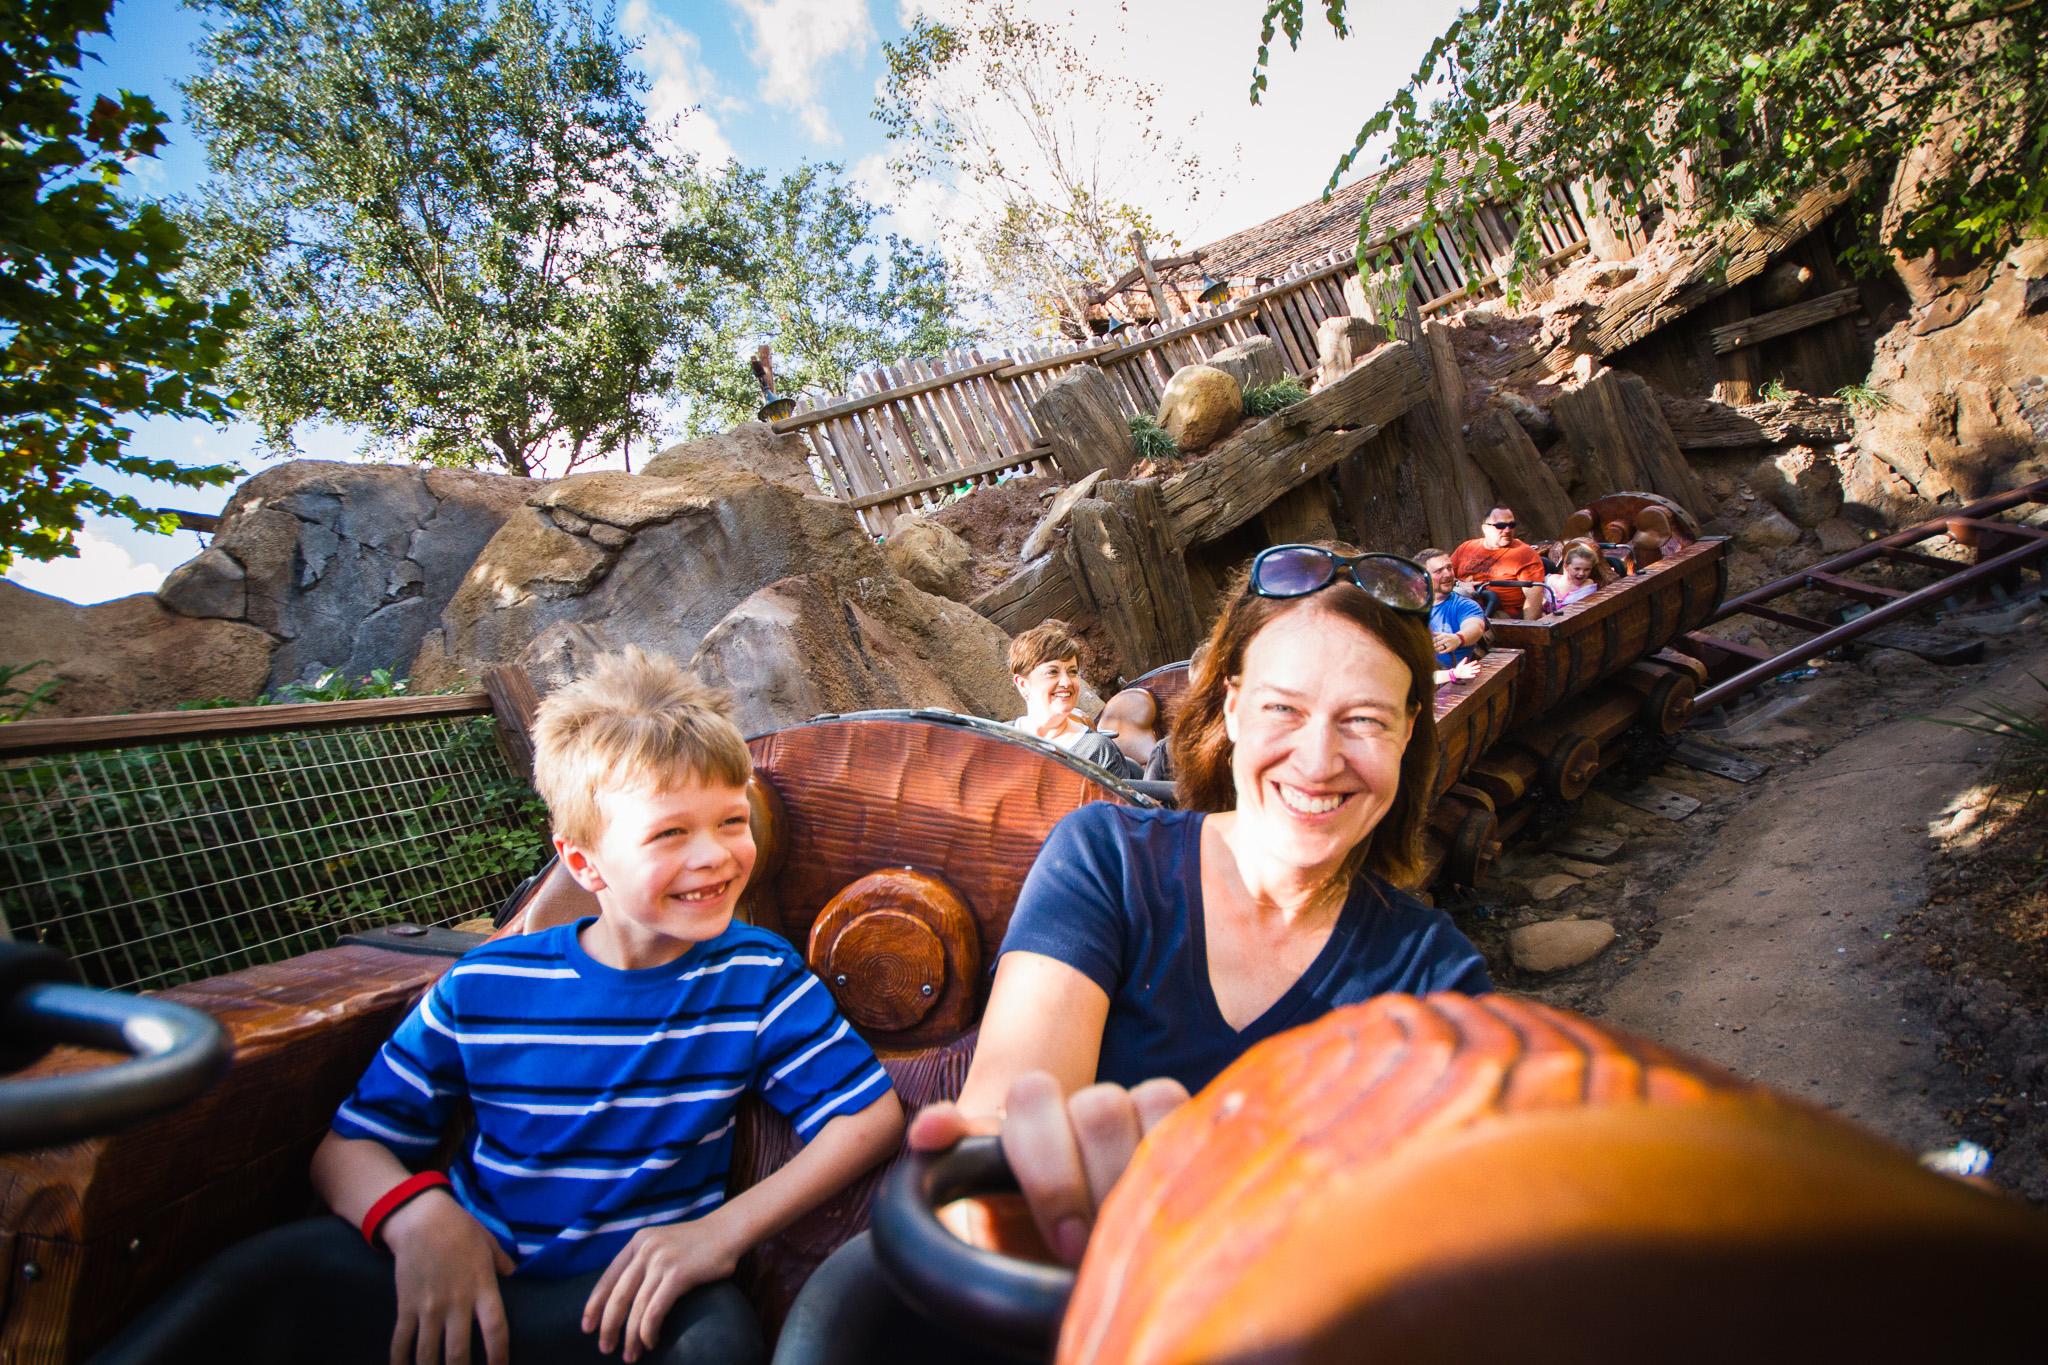 magic kingdom photographer / disney vacation photographer / seven dwarfs mine train